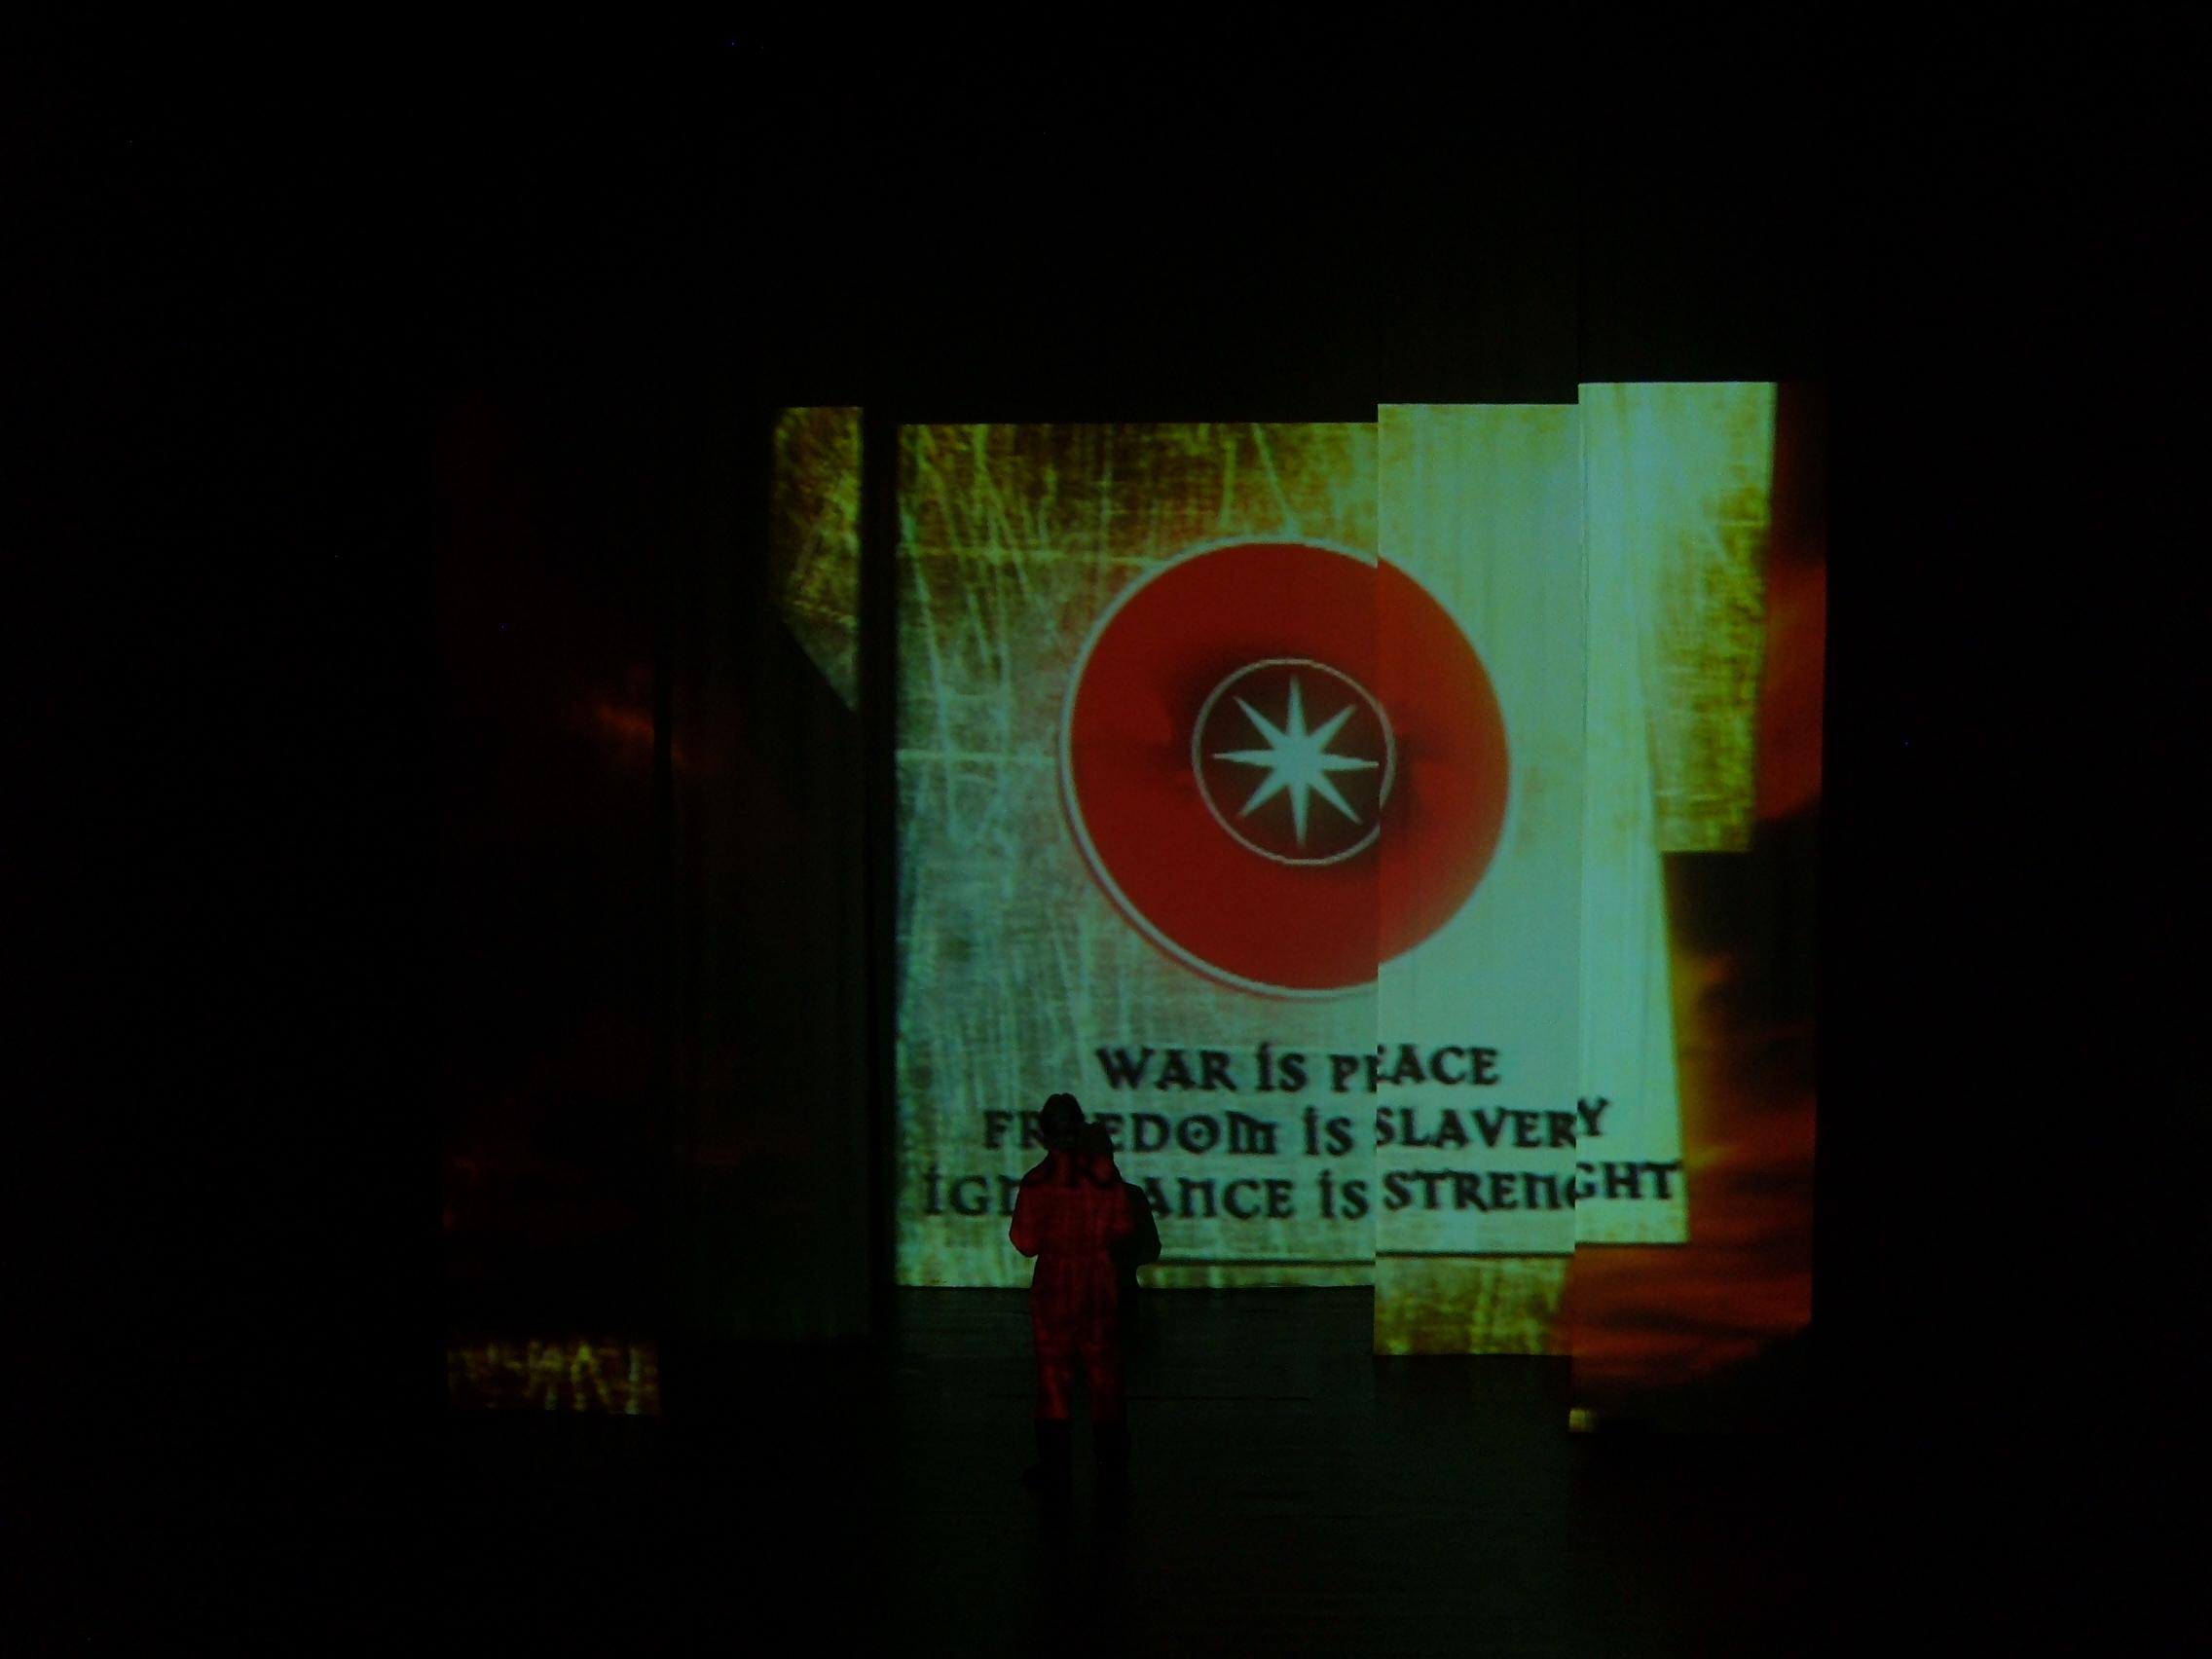 2006. // George Orwell's 1984.